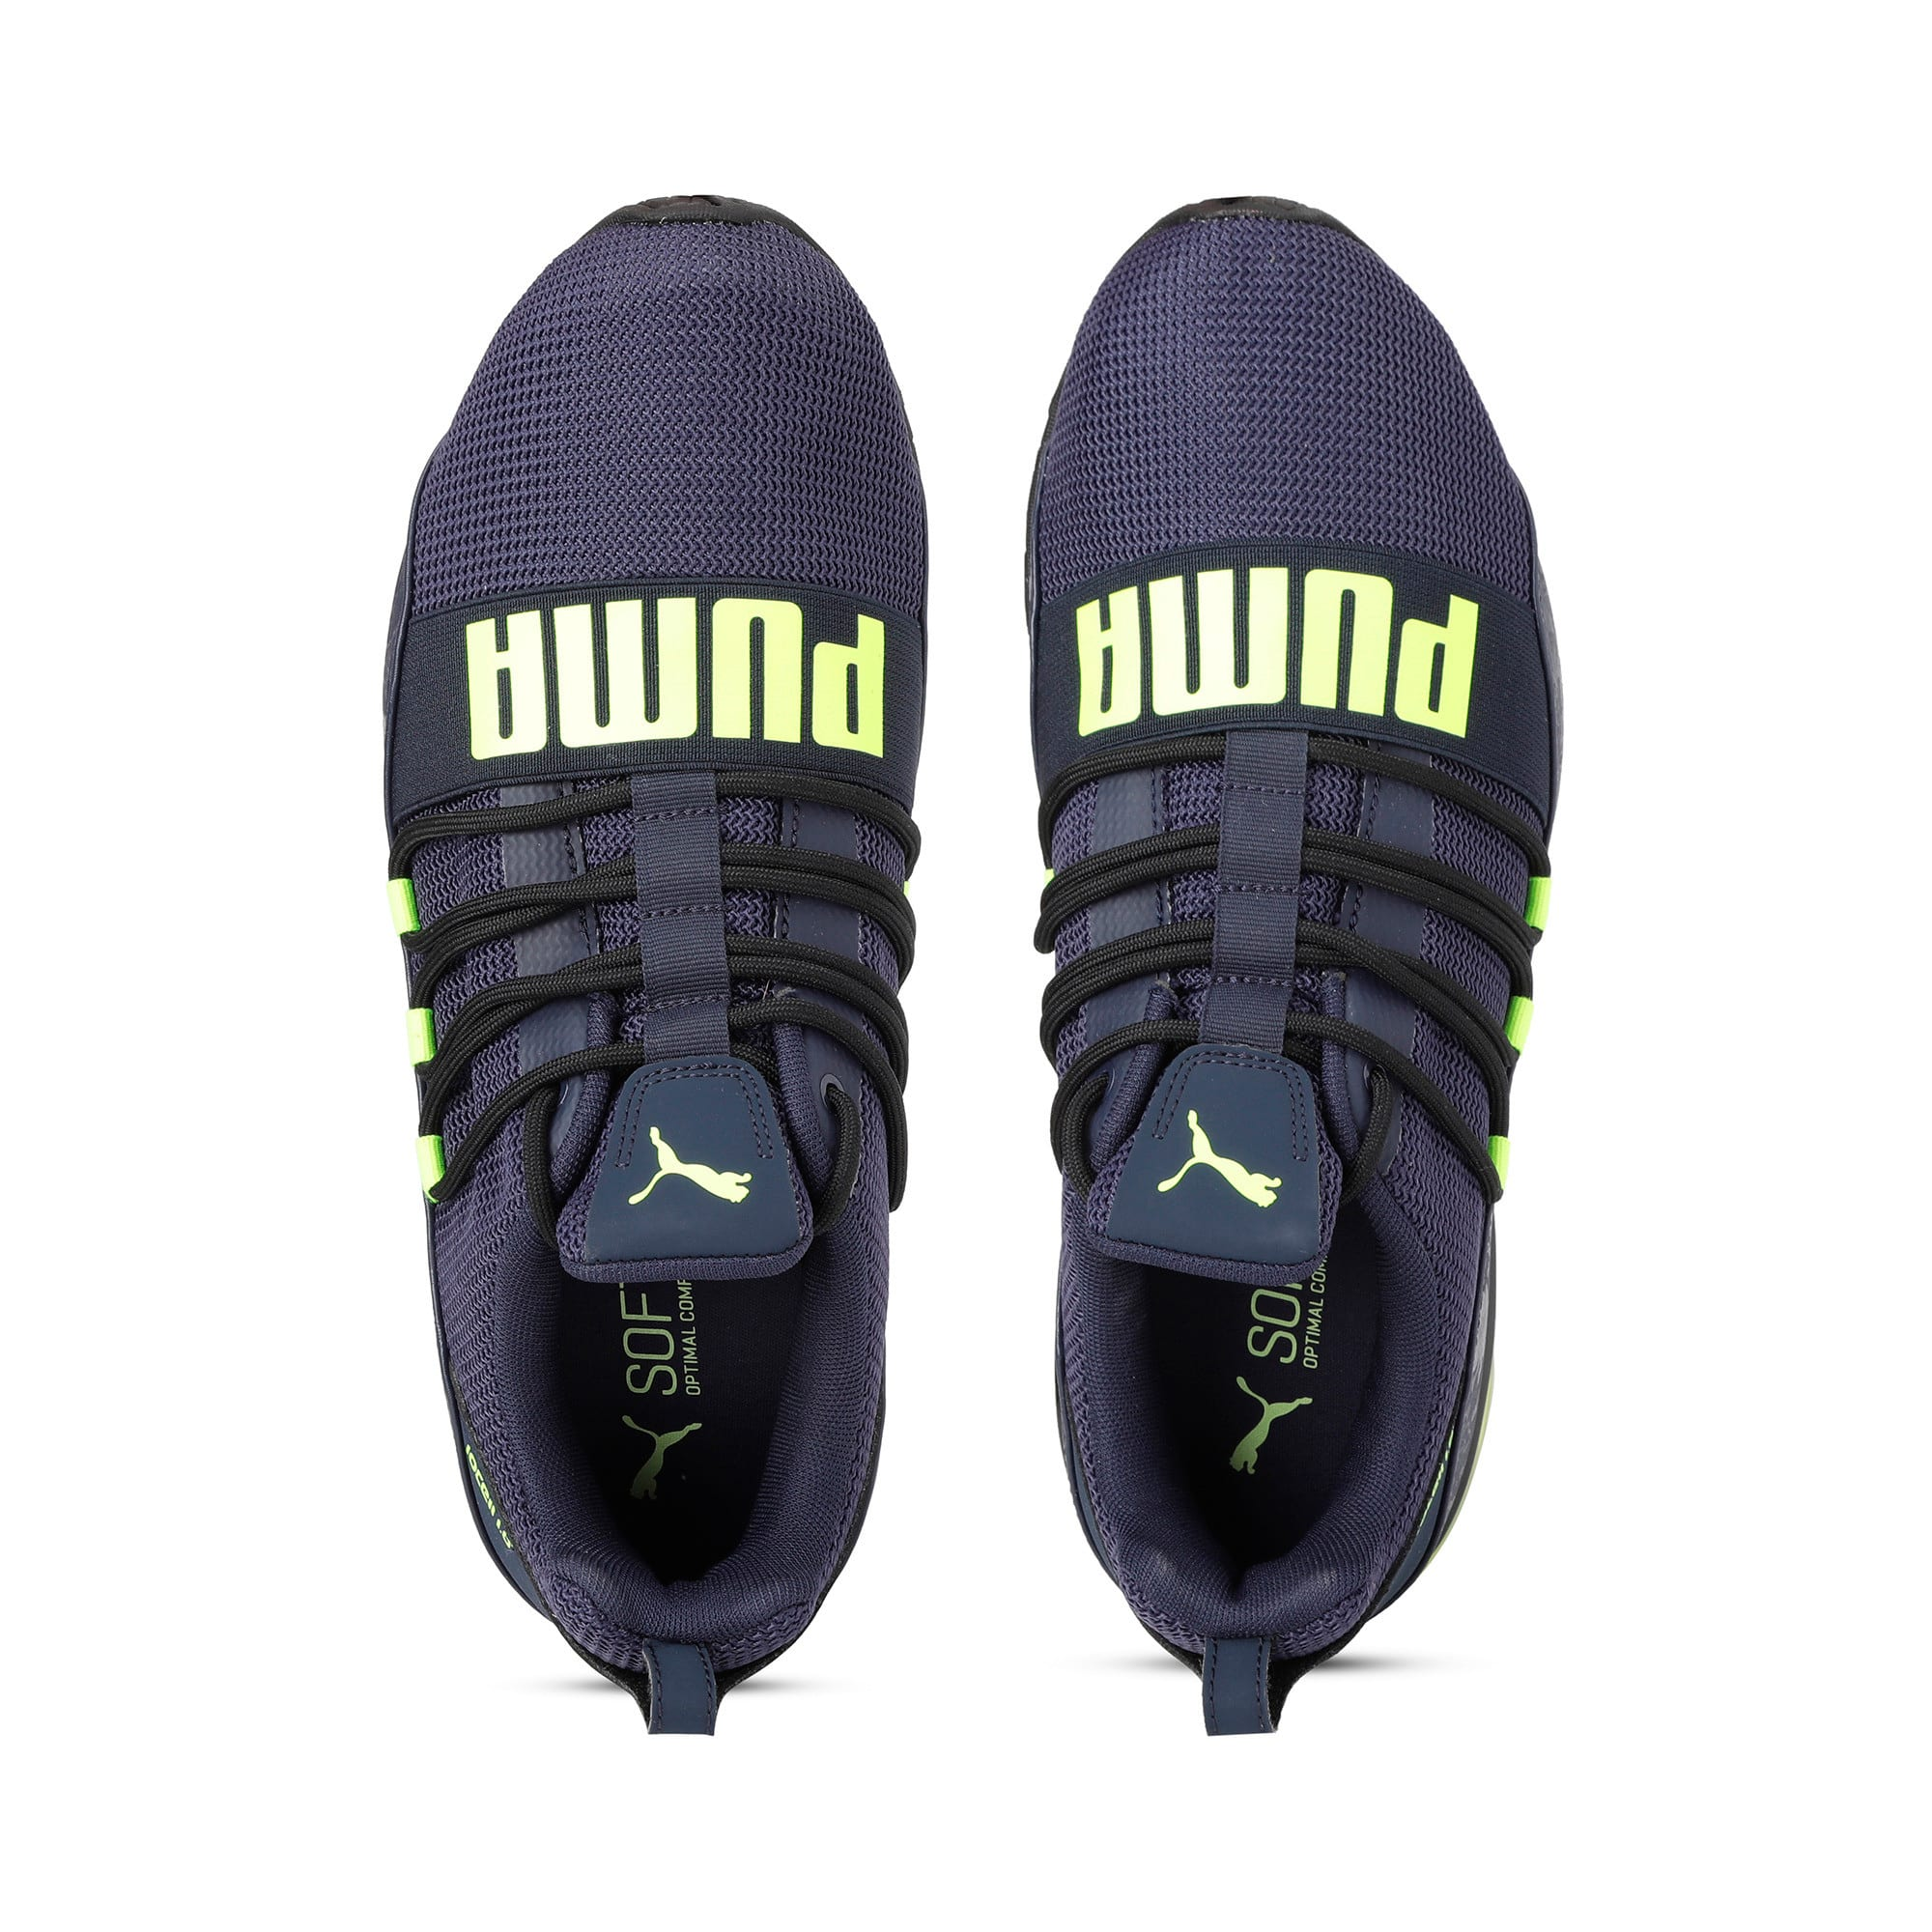 Thumbnail 8 of Cell Regulate Camo Men's Running Shoes, Peacoat-Yellow Alert, medium-IND